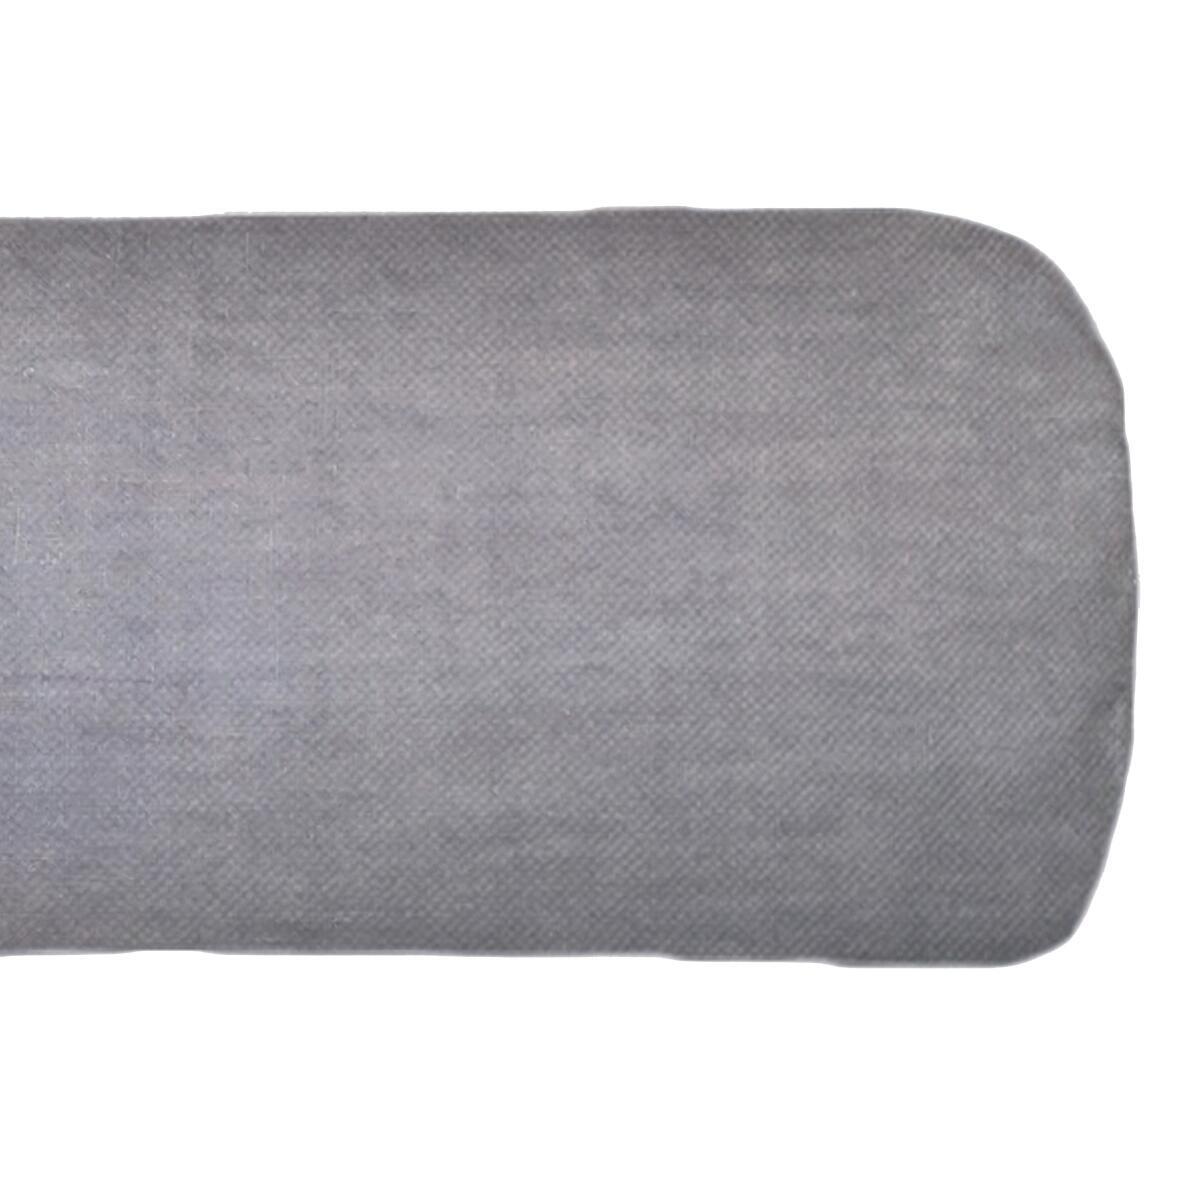 Cuscino Lino viola 20x60 cm - 2